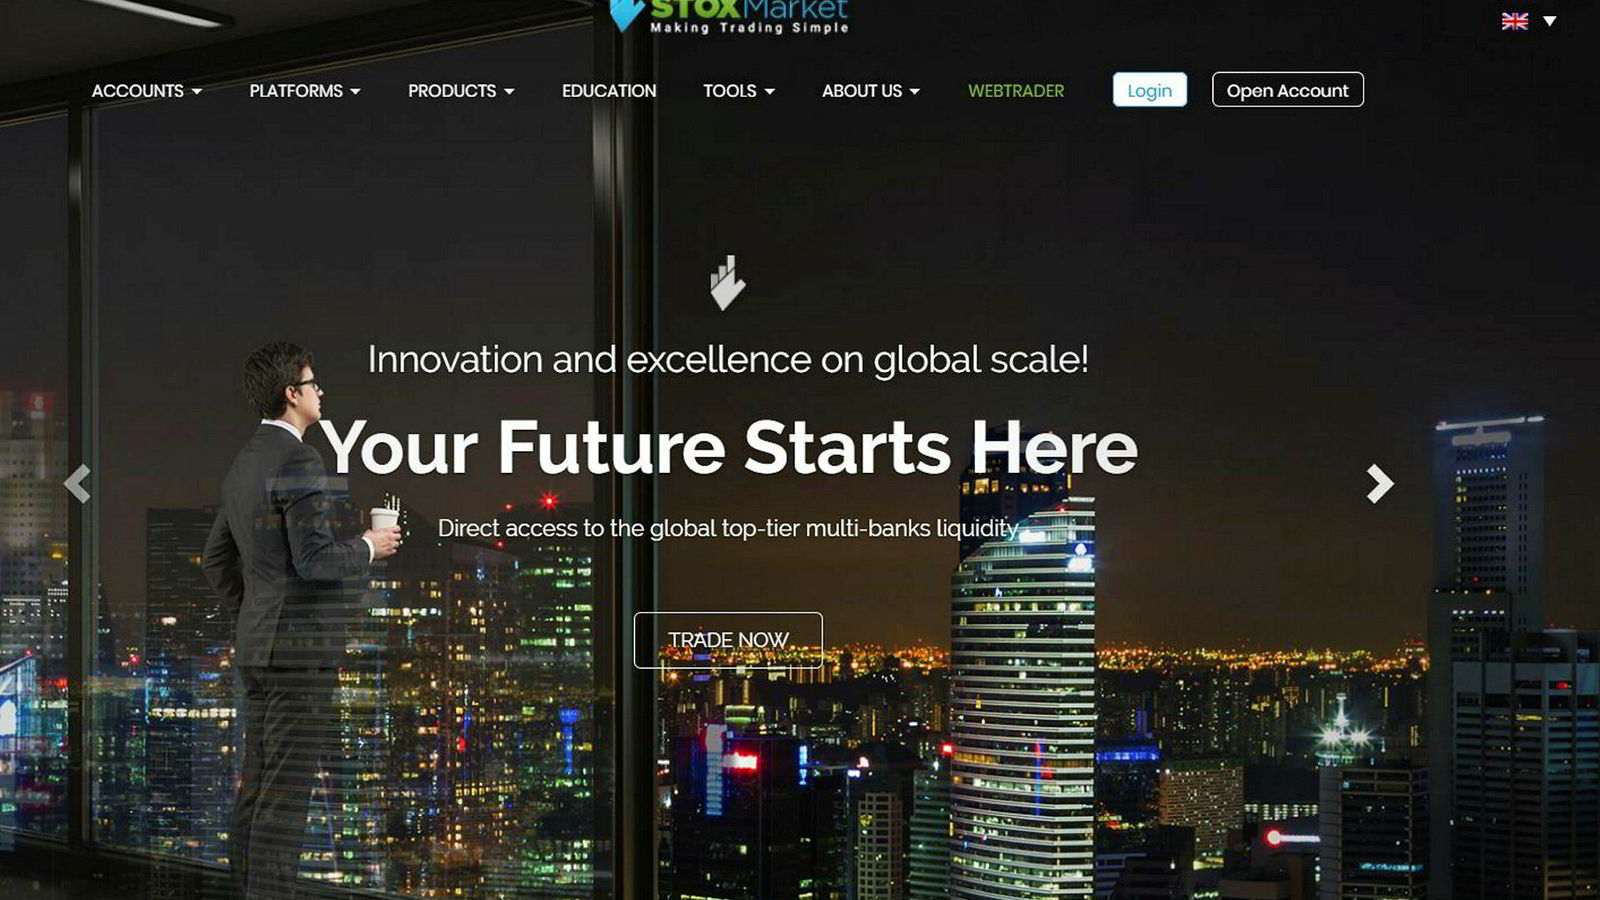 Stoxmarket.com er blant investeringsplattformene som er falske, ifølge DNB.